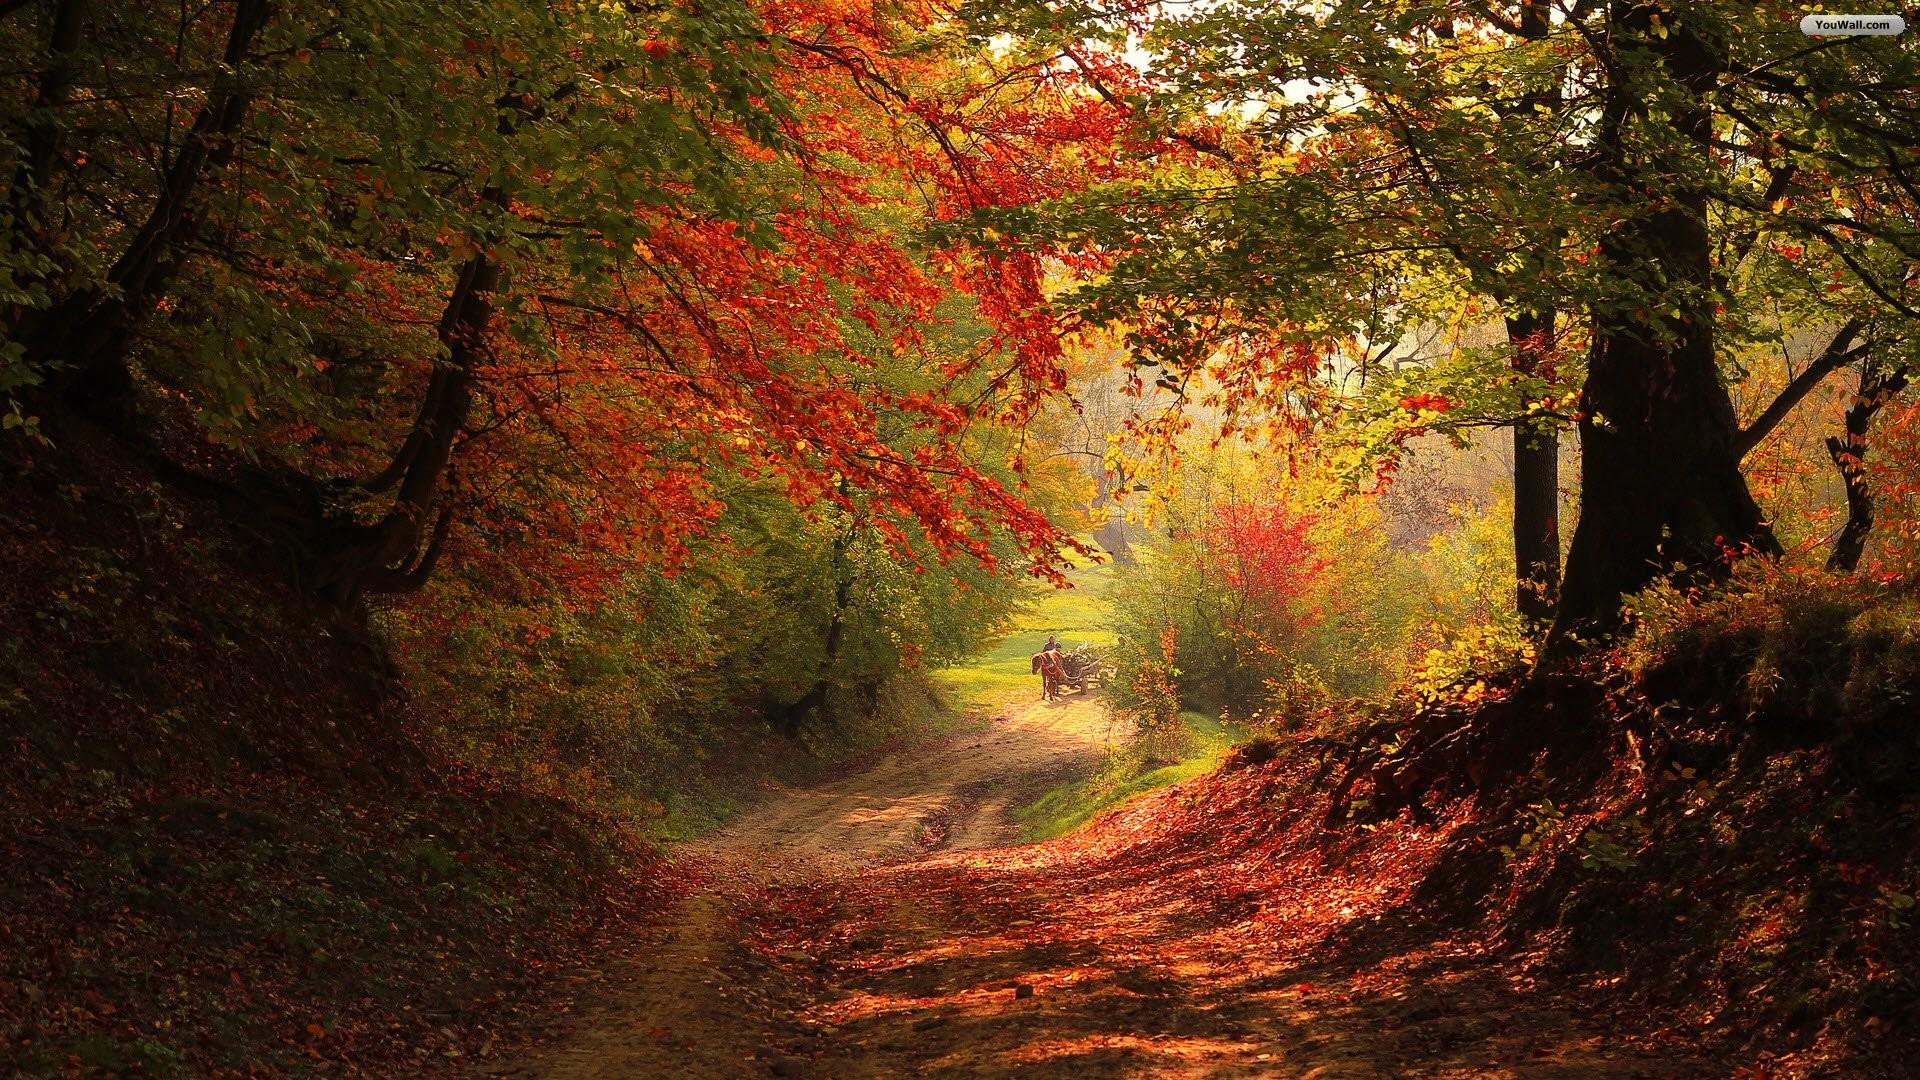 Autumn Forest Path Wallpaper